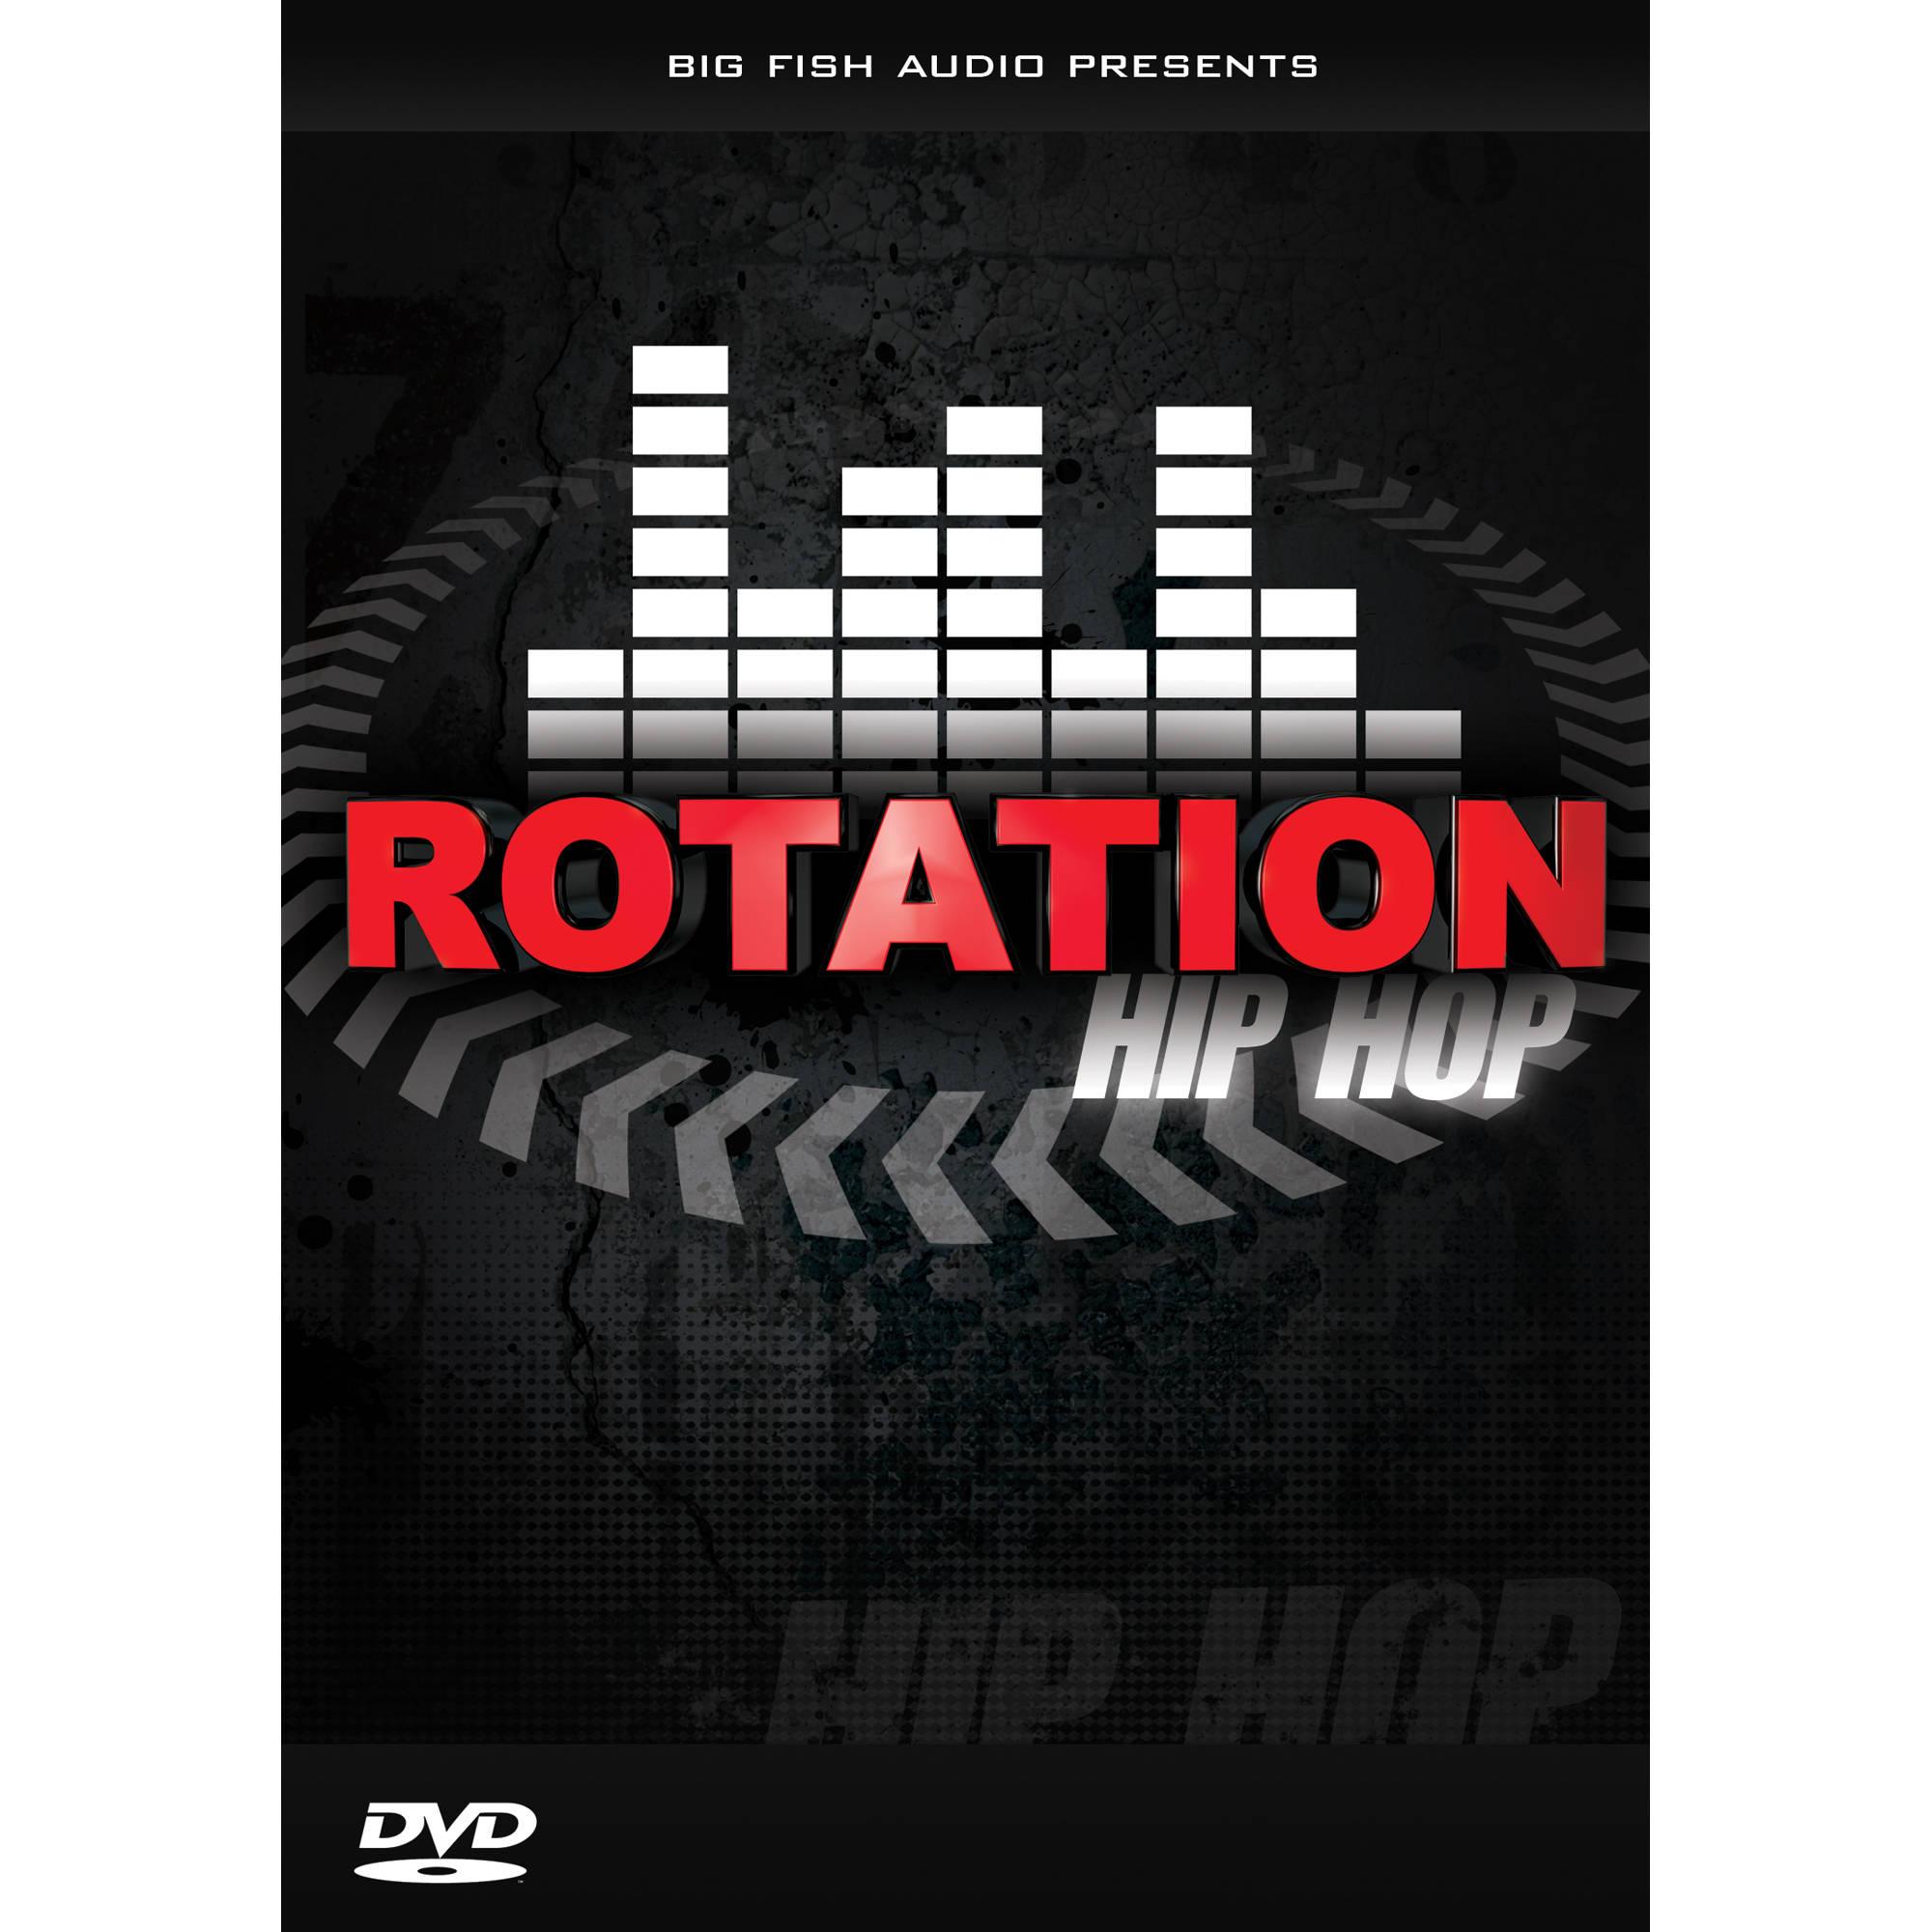 Big fish audio rotation hip hop dvd rota1 orwxz b h photo for Big fish audio